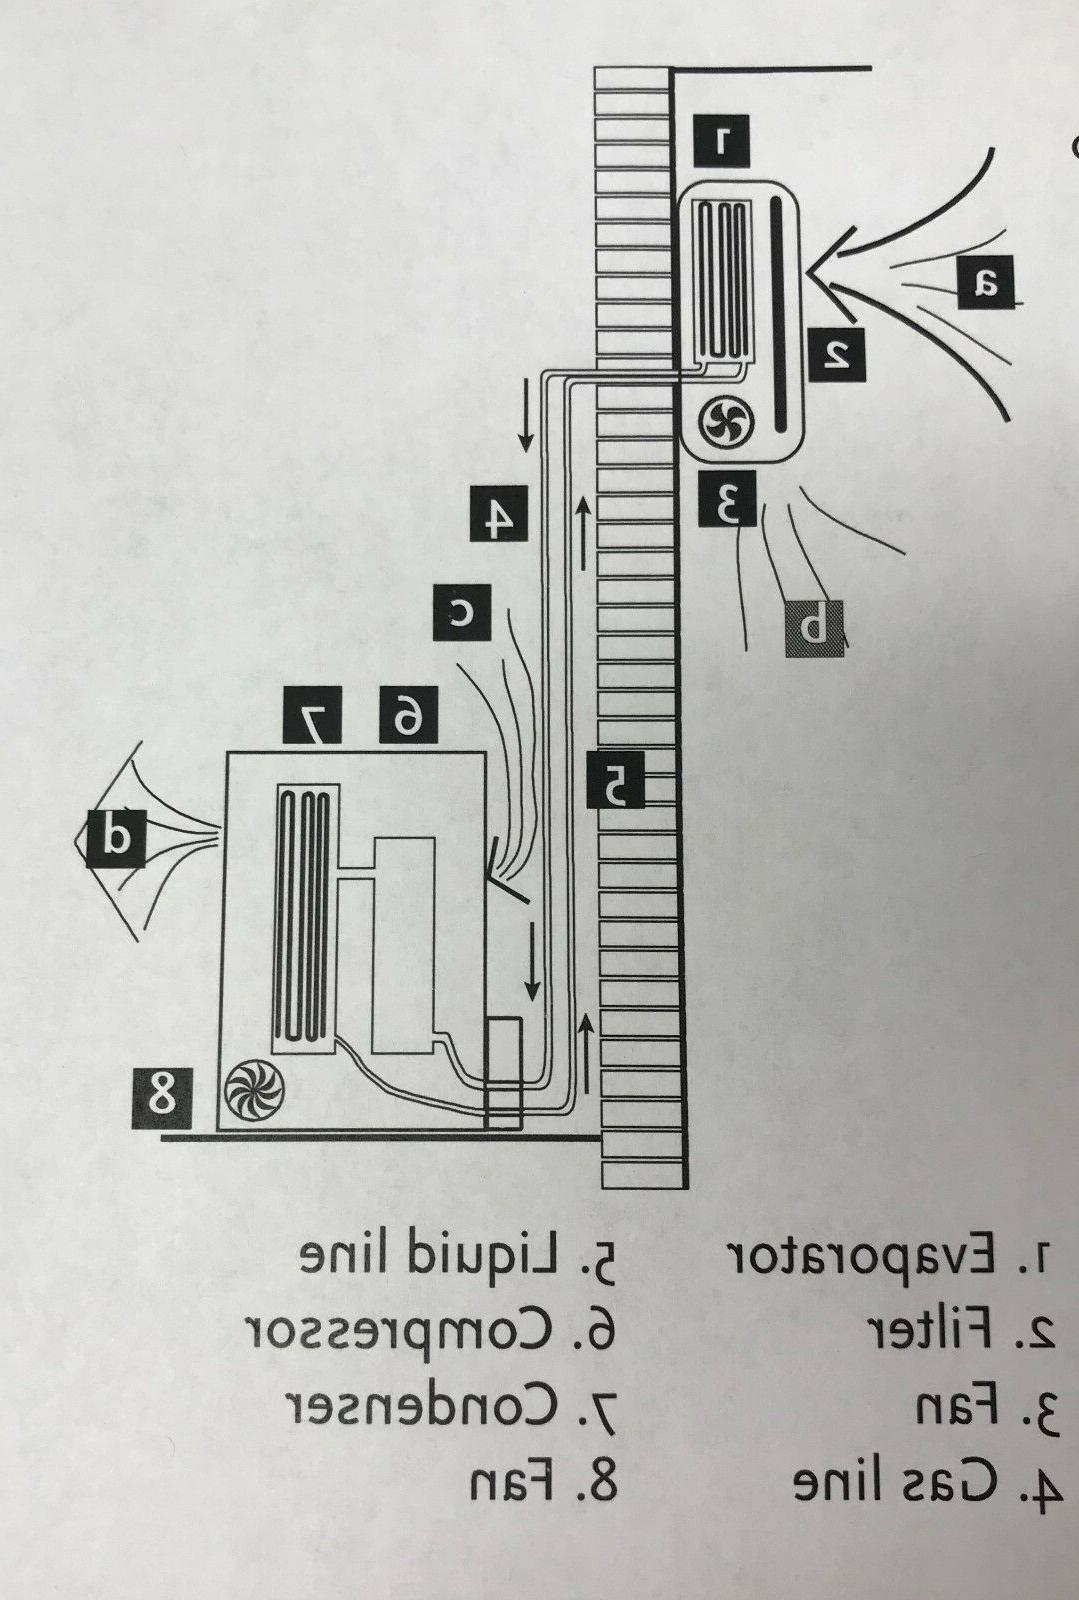 AMCORAIRE BTU Split Conditioner NEW IN BOXES